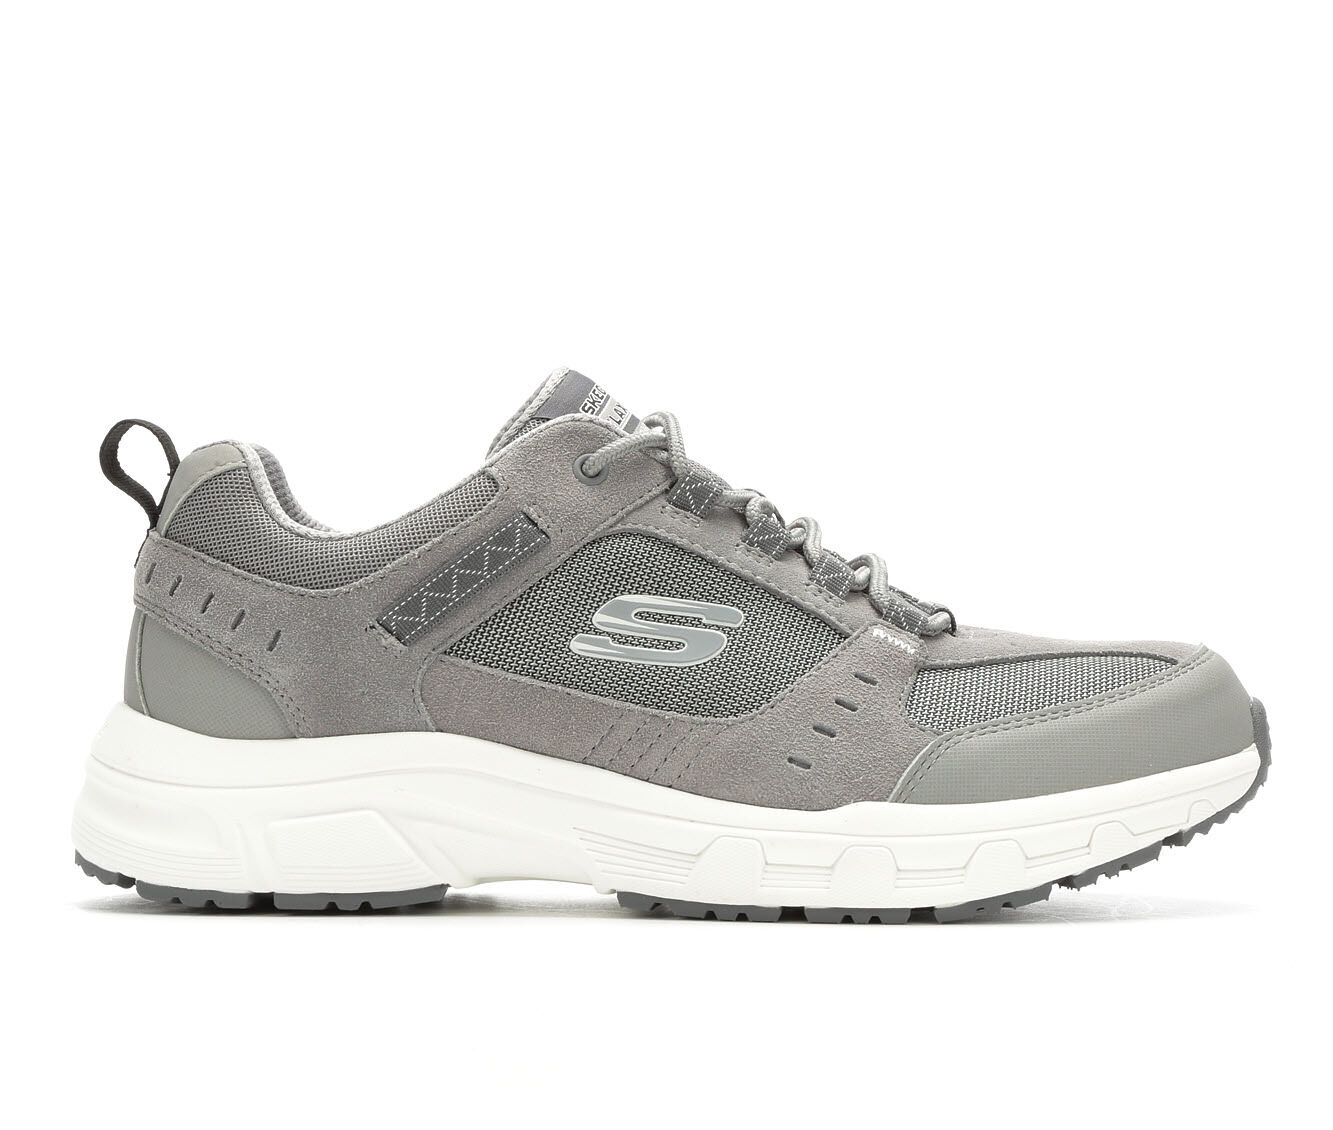 Men's Skechers Oak Canyon 51893 Athletic Shoes Grey